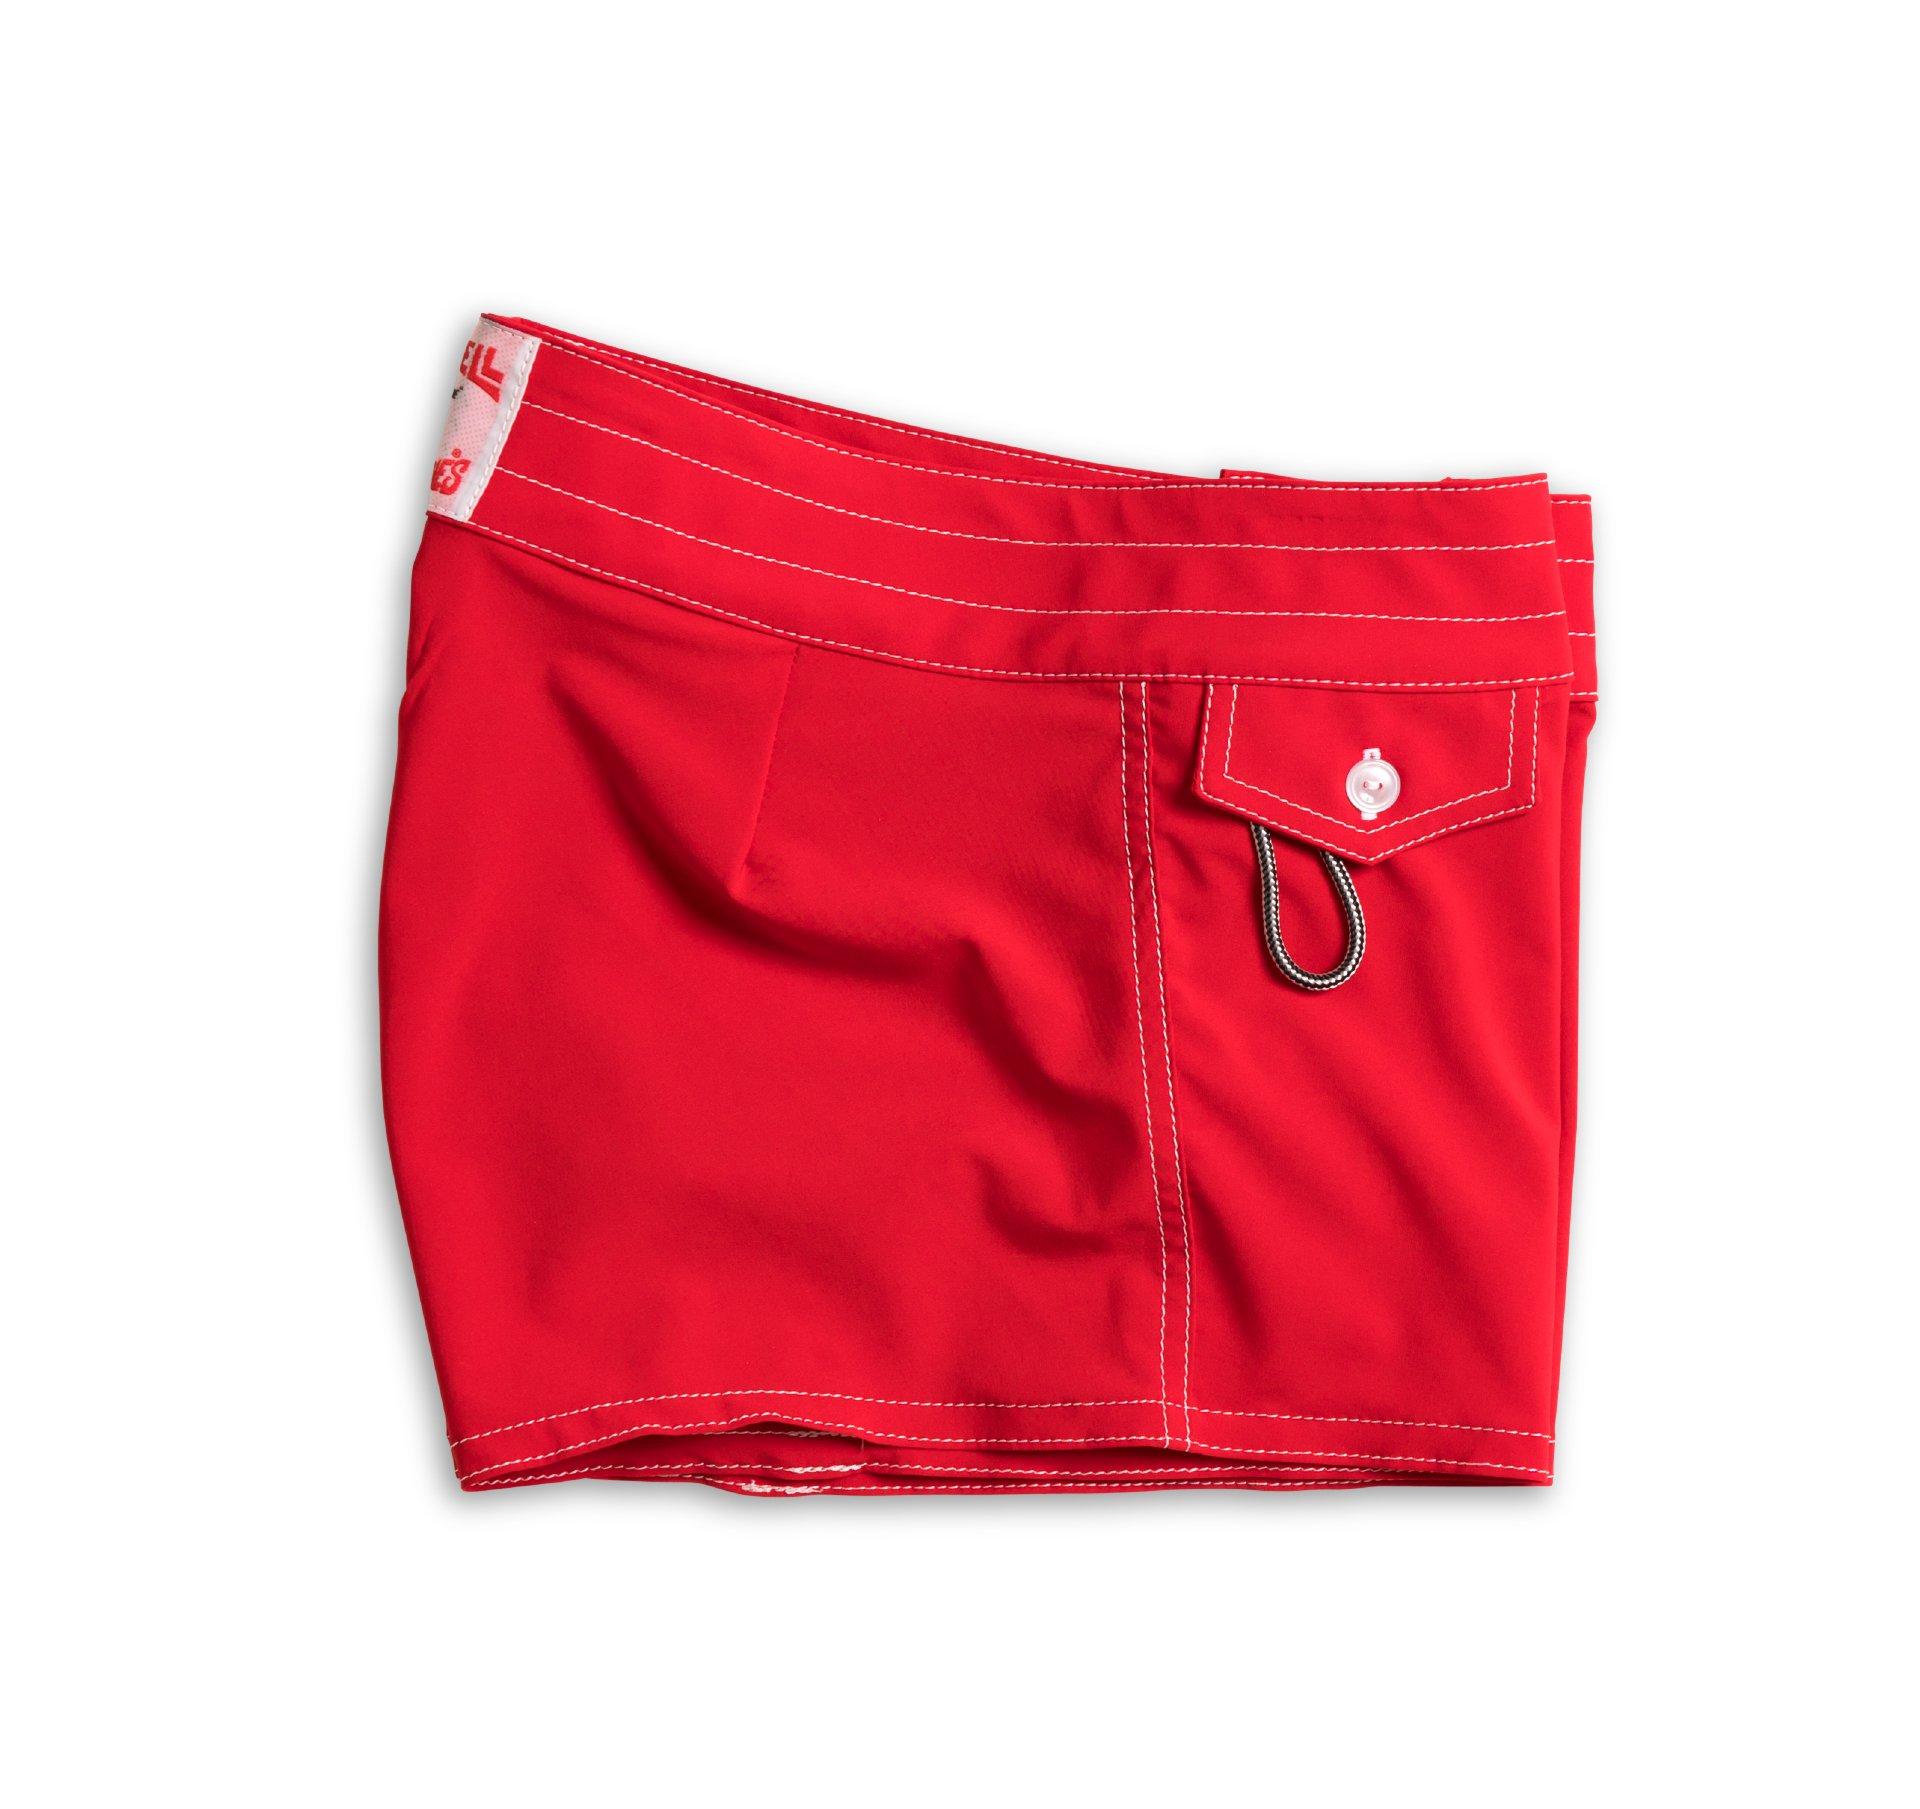 Birdwell Women's Stretch Board Shorts - Regular Rise (Red, 2) by Birdwell Beach Britches (Image #3)